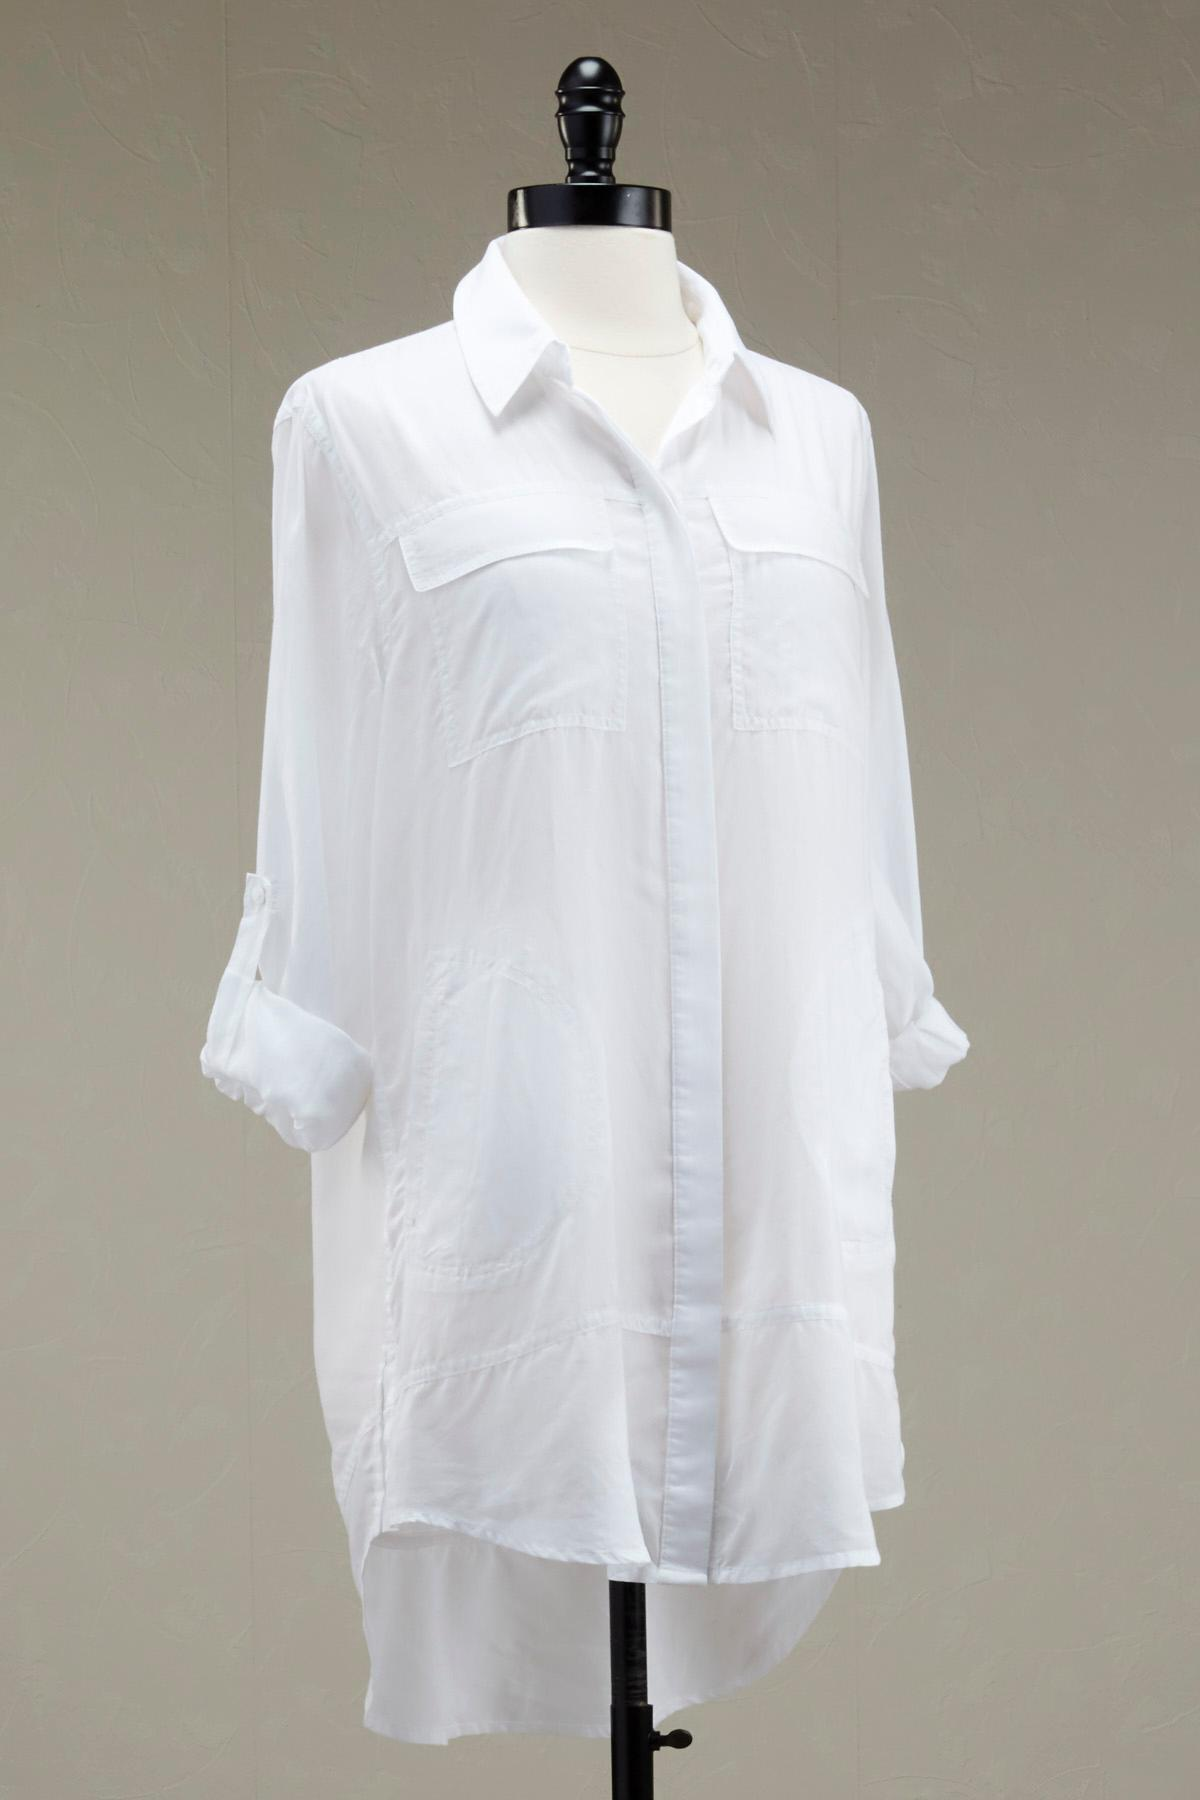 Roll Tab Button Down Shirt